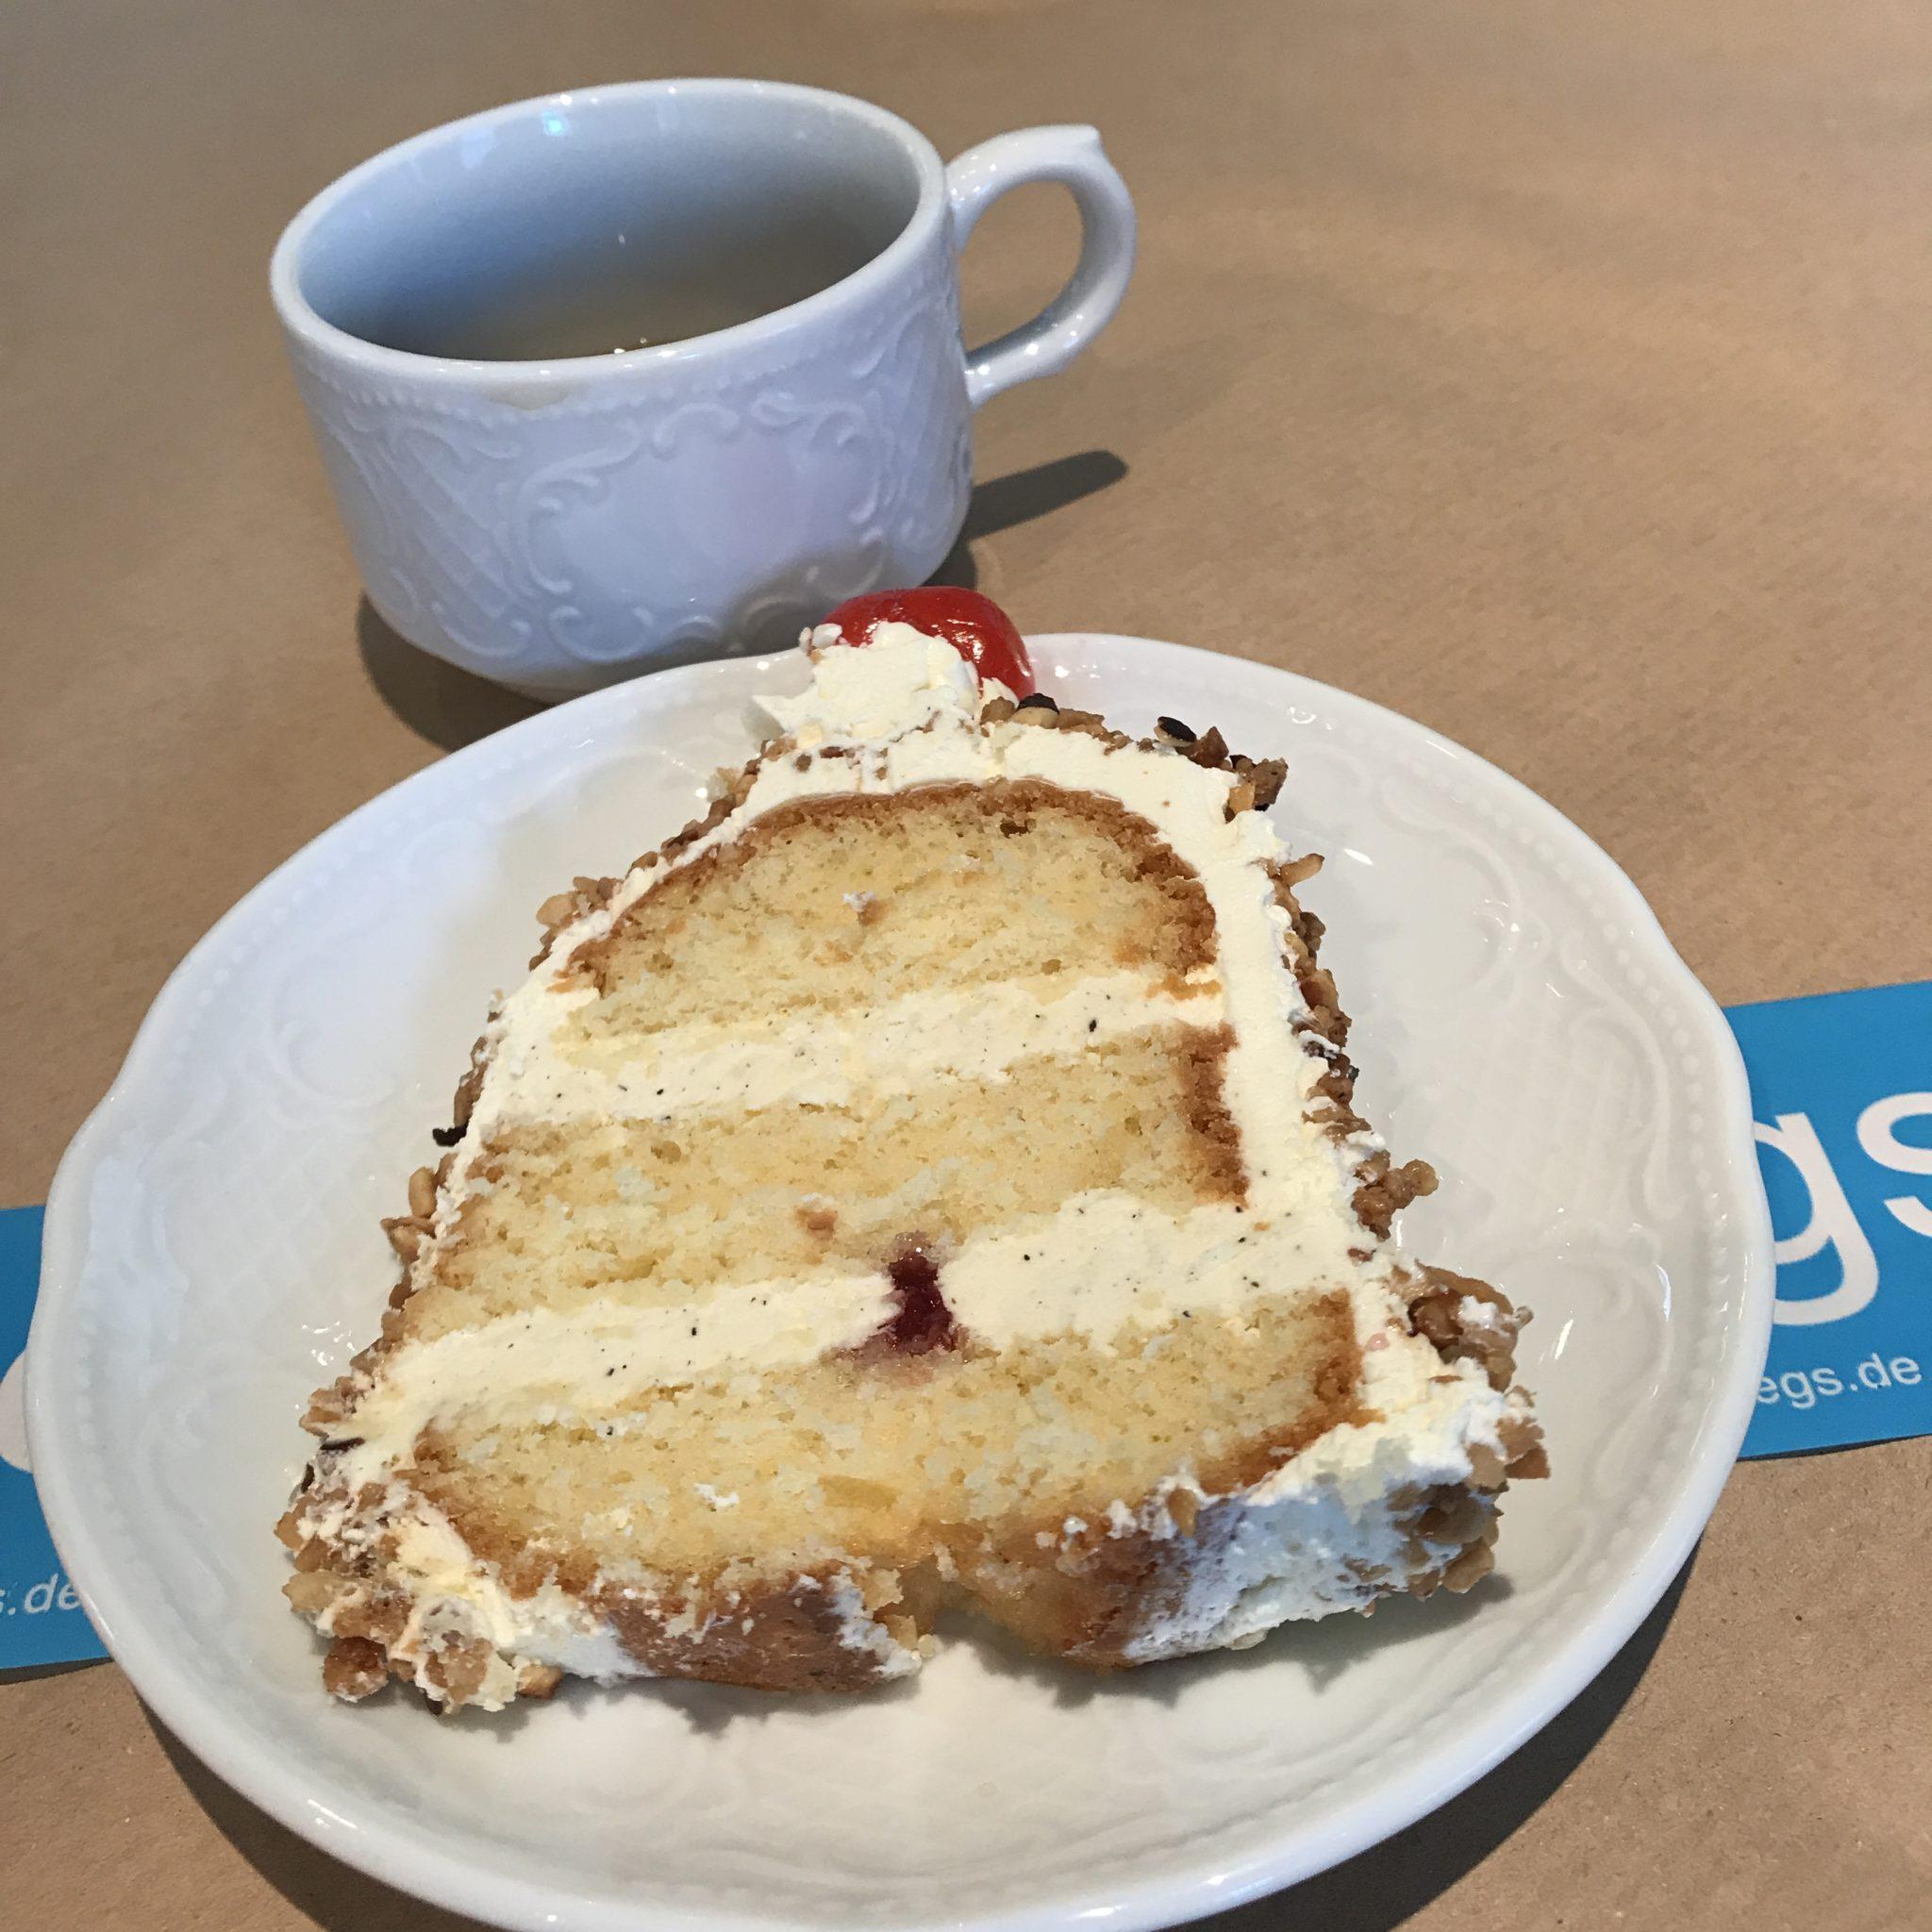 historisches museum frankfurt: the subjective Museum - Frankfurter Kränzchen - the famaous Frankfurt cake